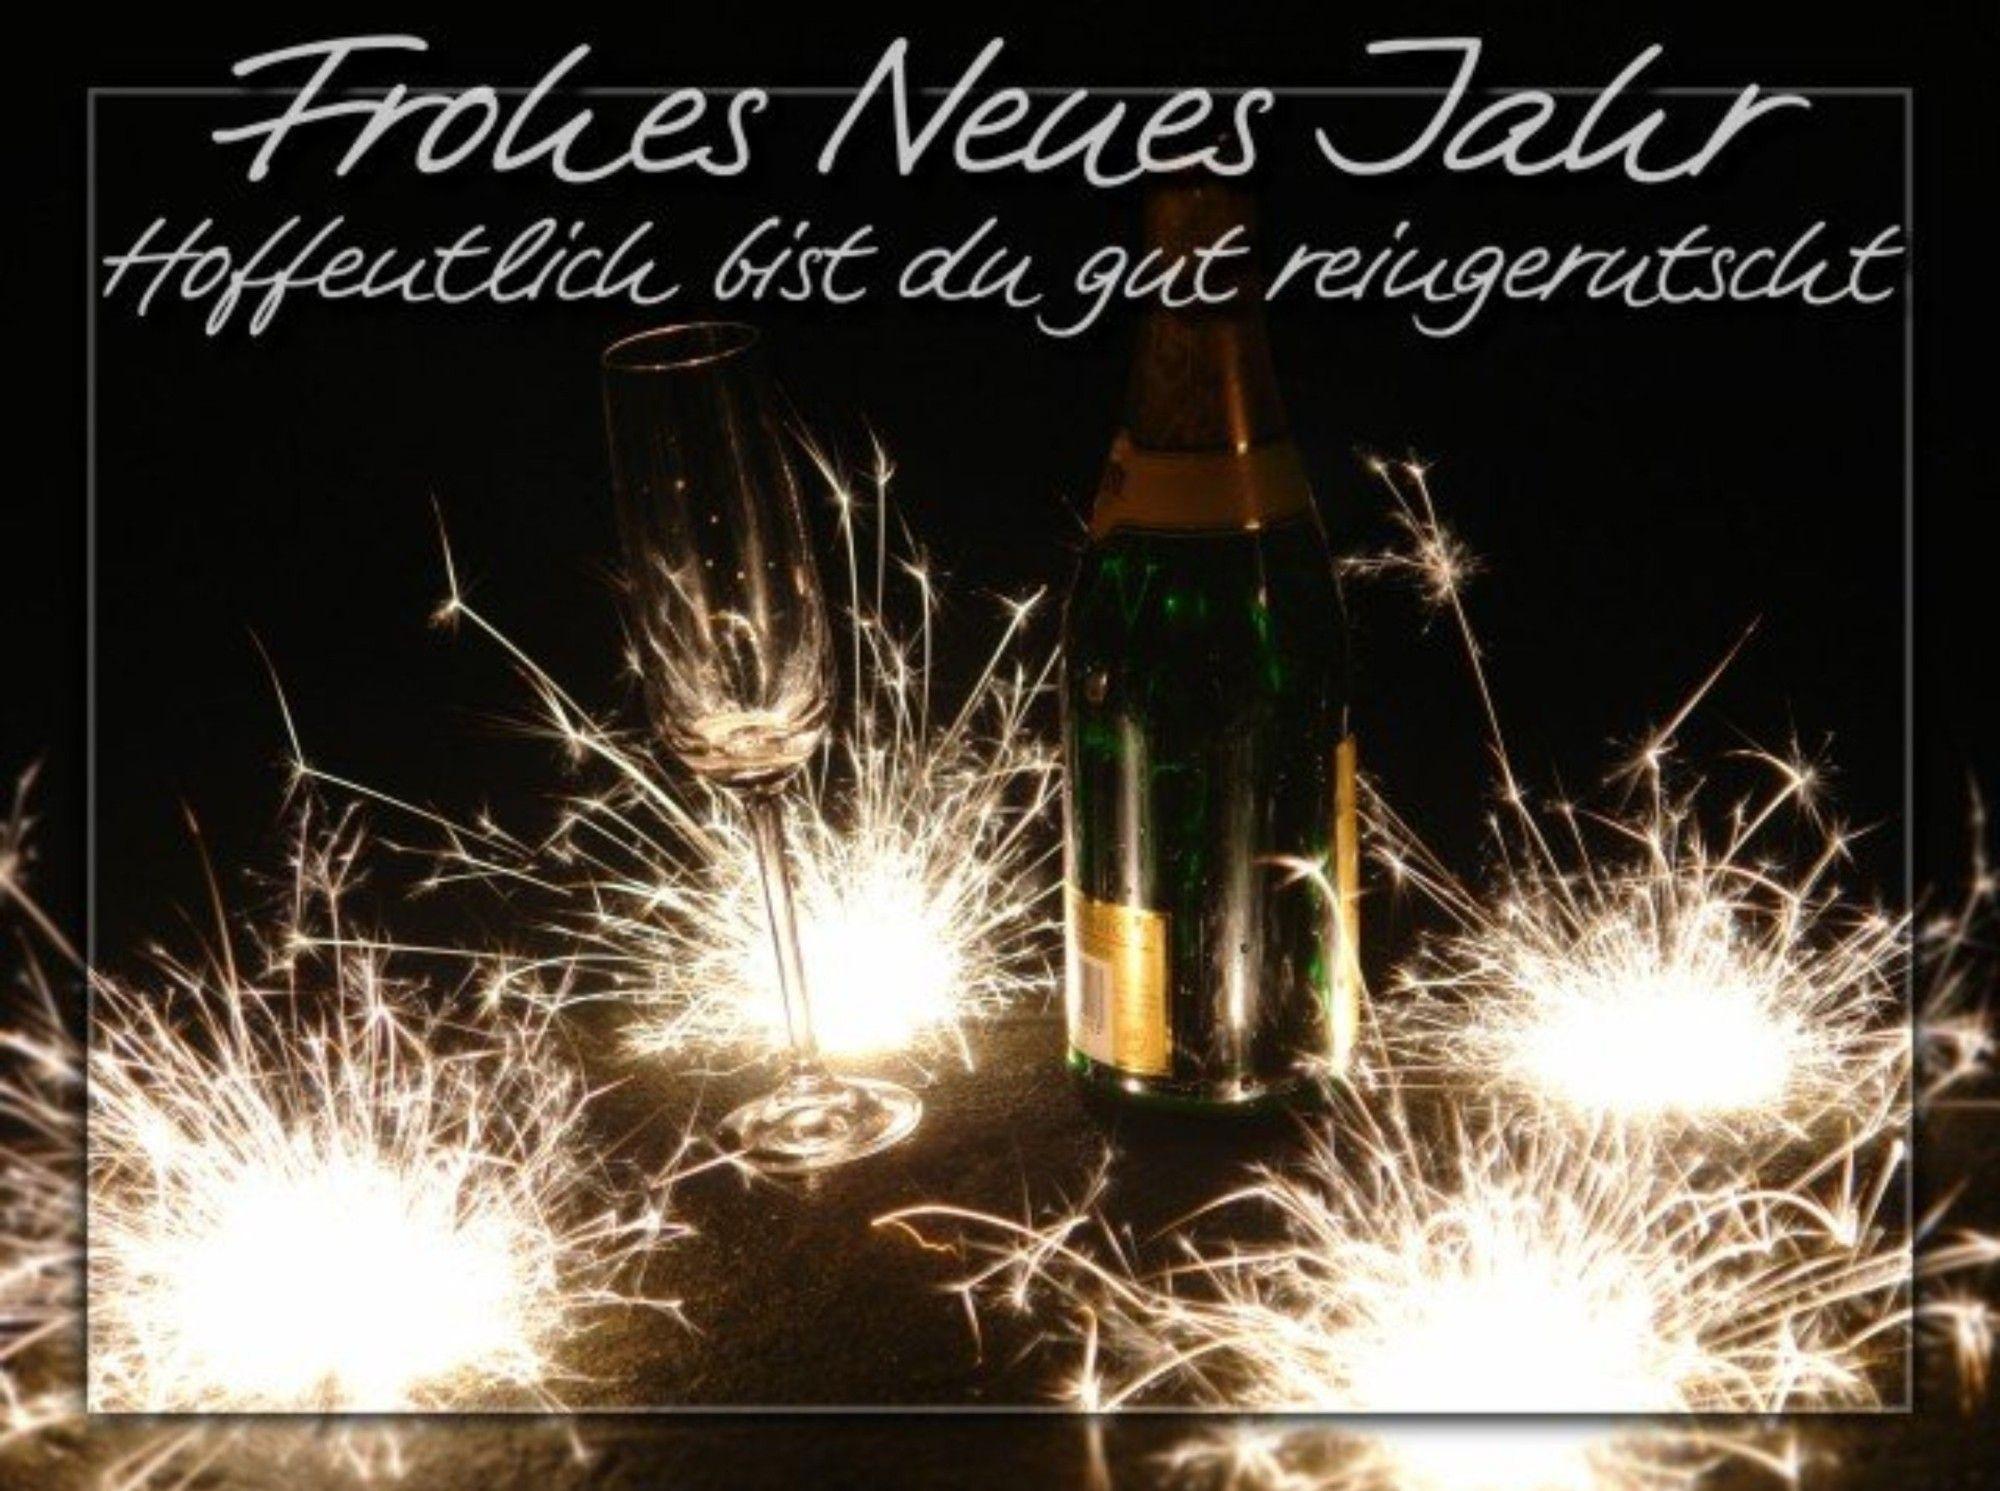 Segen Für Das Neue Jahr - Segen Für Das Neue Jahr